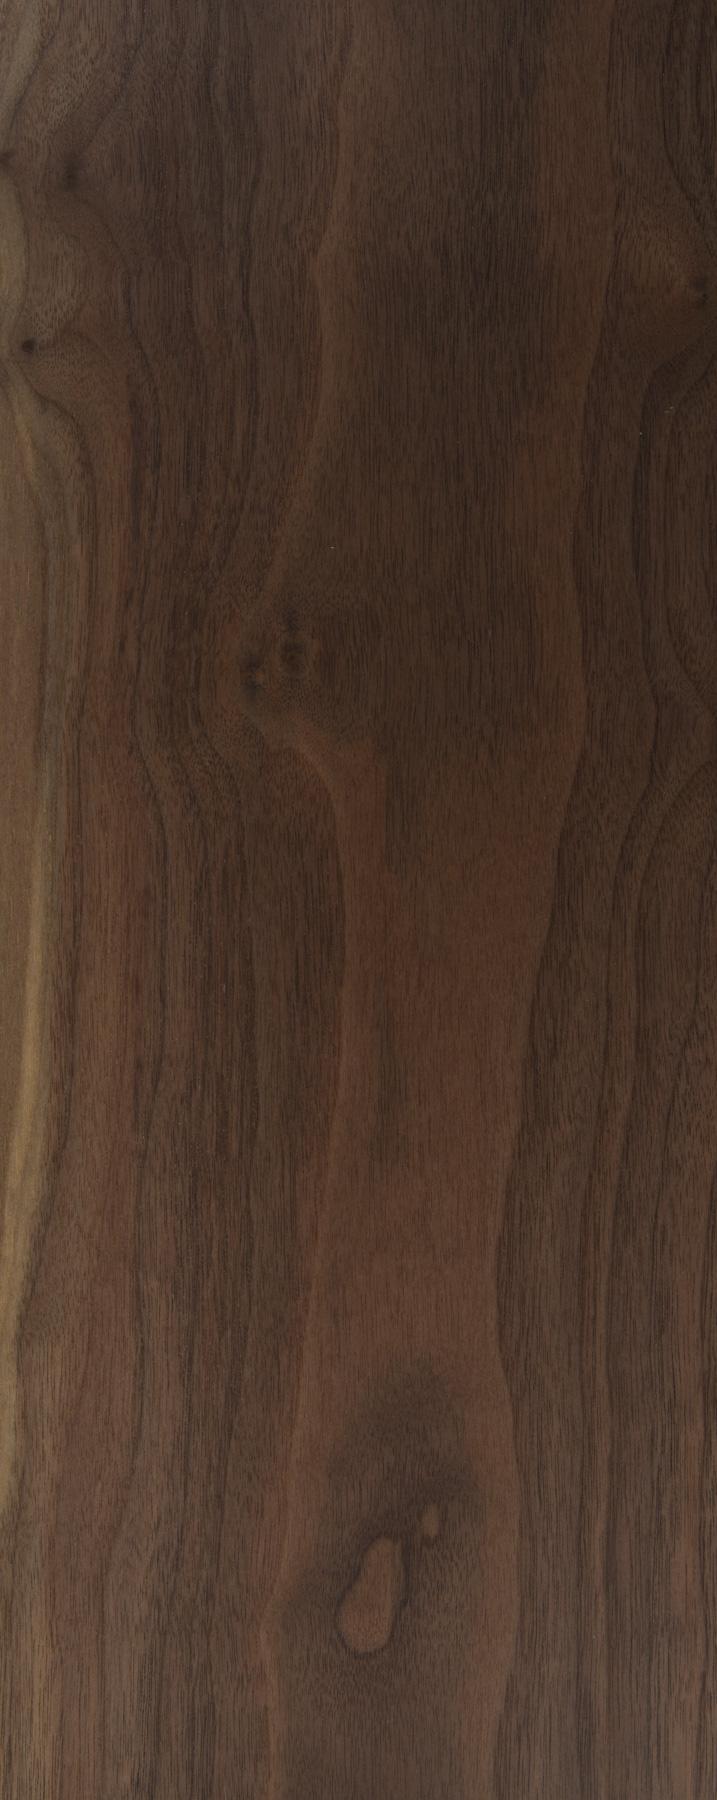 maderas-terramont-true-toro-american-walnut-19